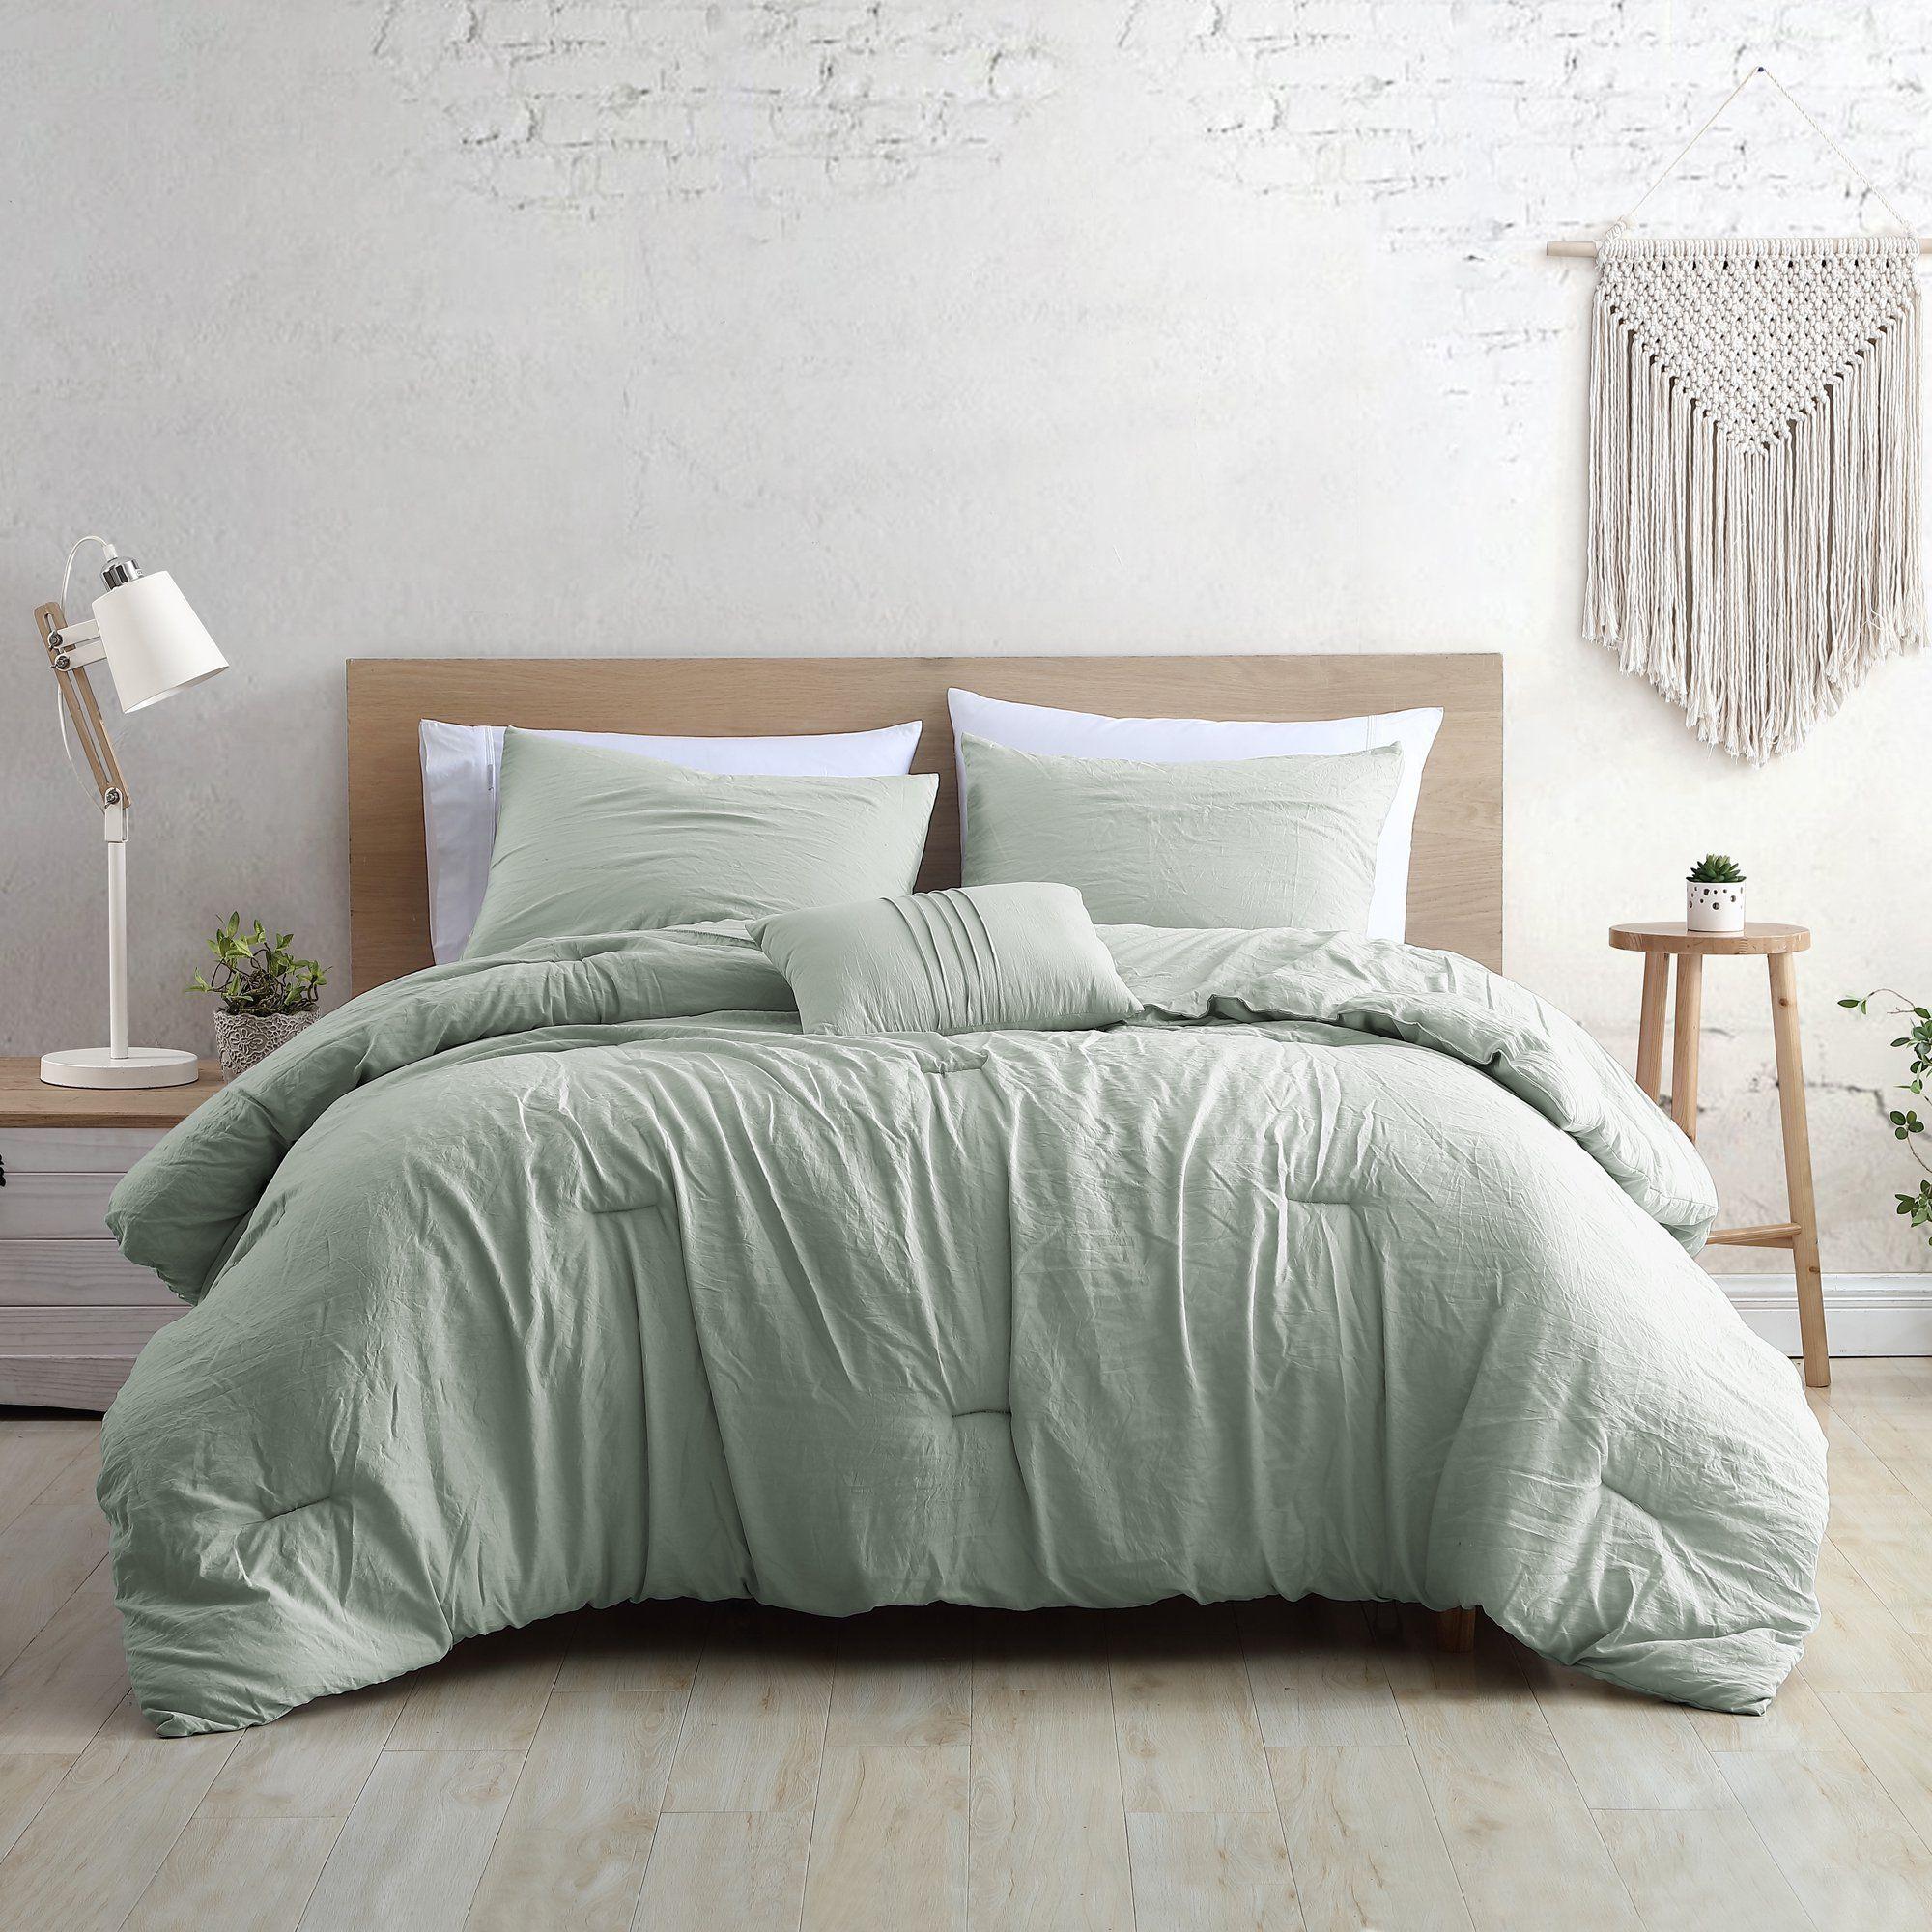 Modern Threads Beck Garment Washed 4 Piece Super Soft Comforter Set Full Queen Sage Walmart Com In 2021 Sage Green Bedroom Sage Bedroom Comforter Sets